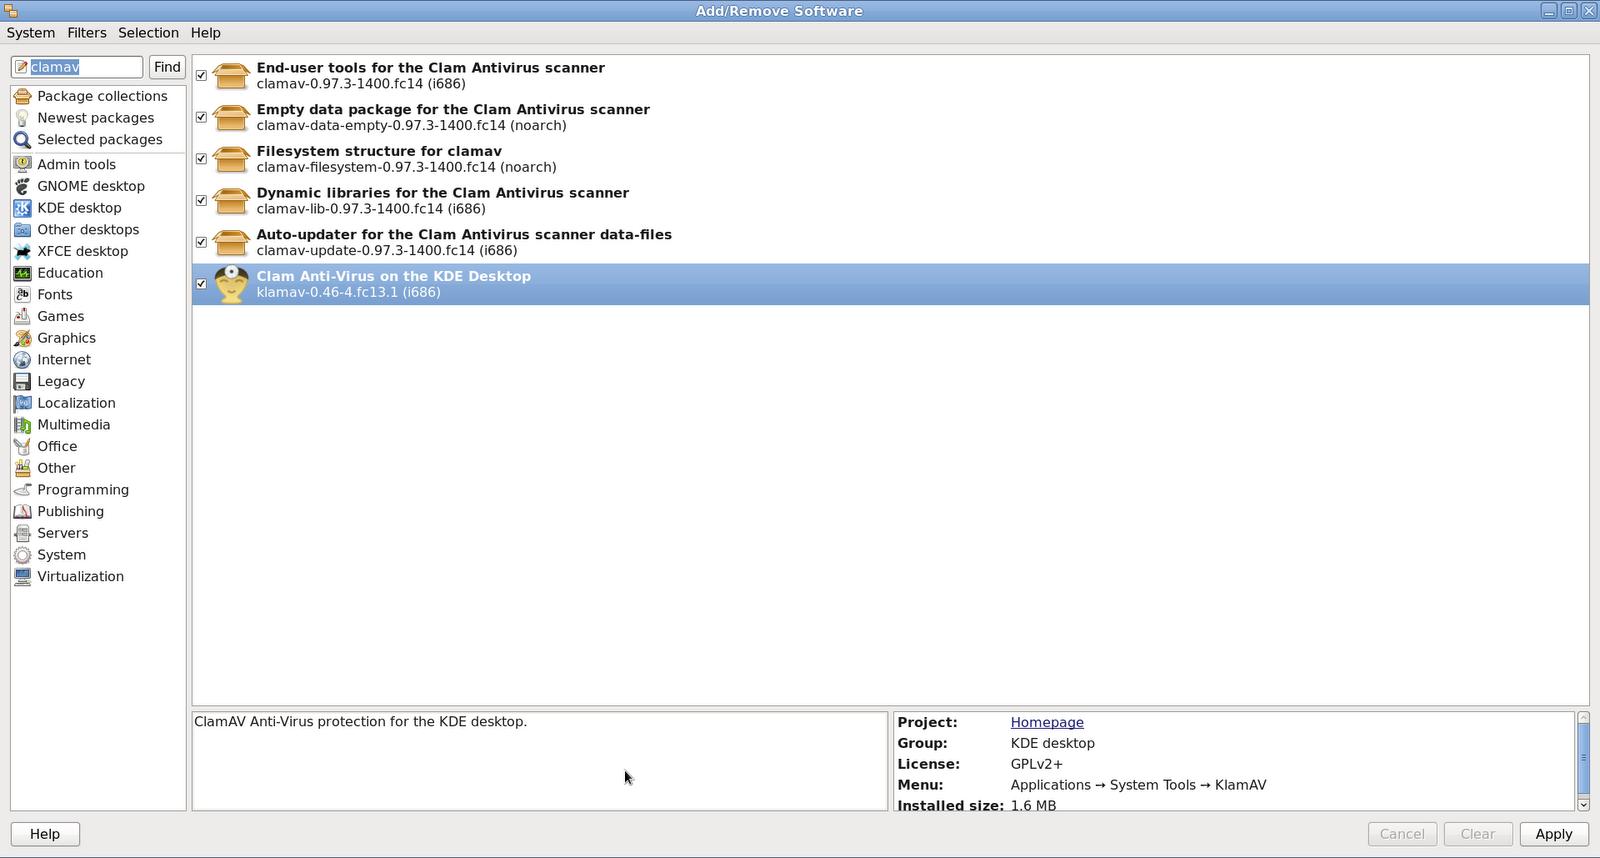 CrowdStrike - HTTP iframe Injecting Linux Rootkit (Vrius